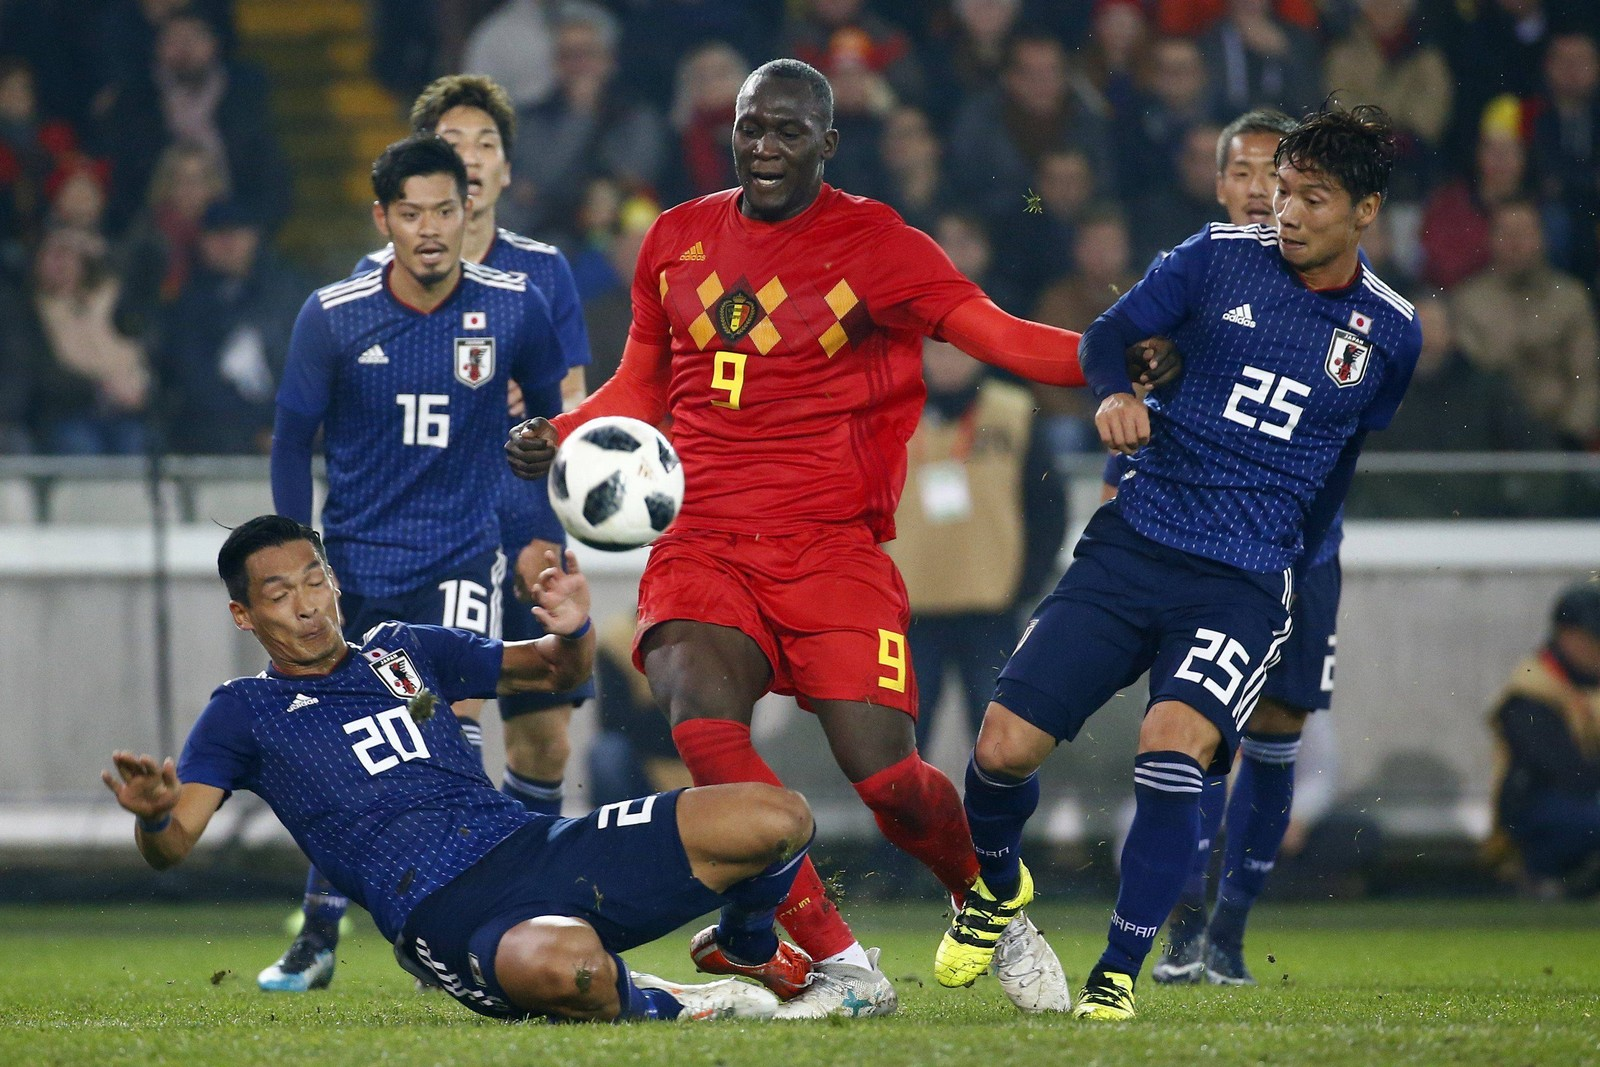 Prognose Belgien Japan